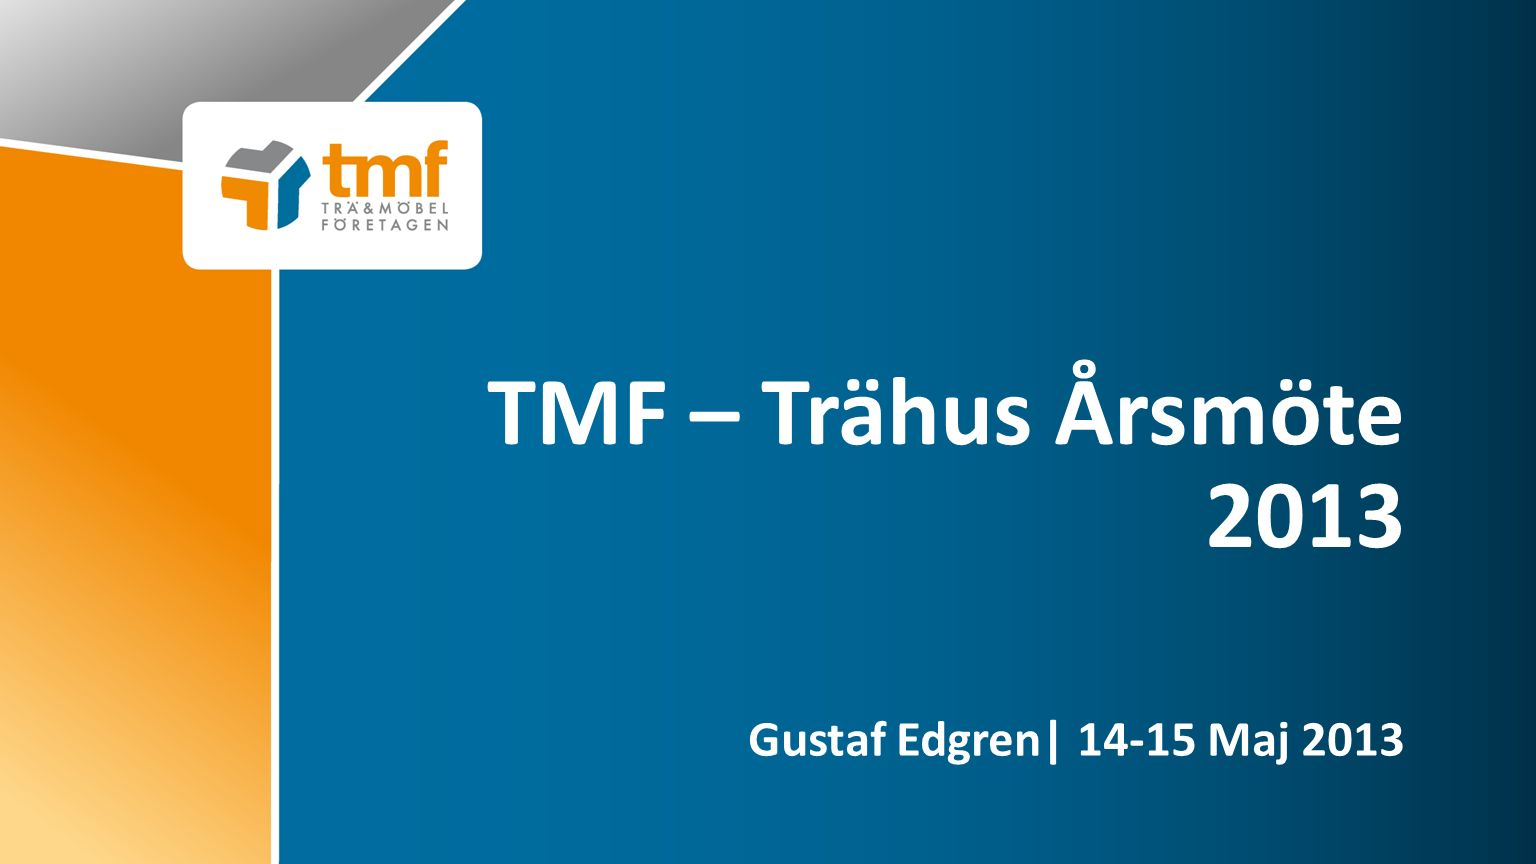 TMF – Trähus Årsmöte 2013 Gustaf Edgren| 14-15 Maj 2013